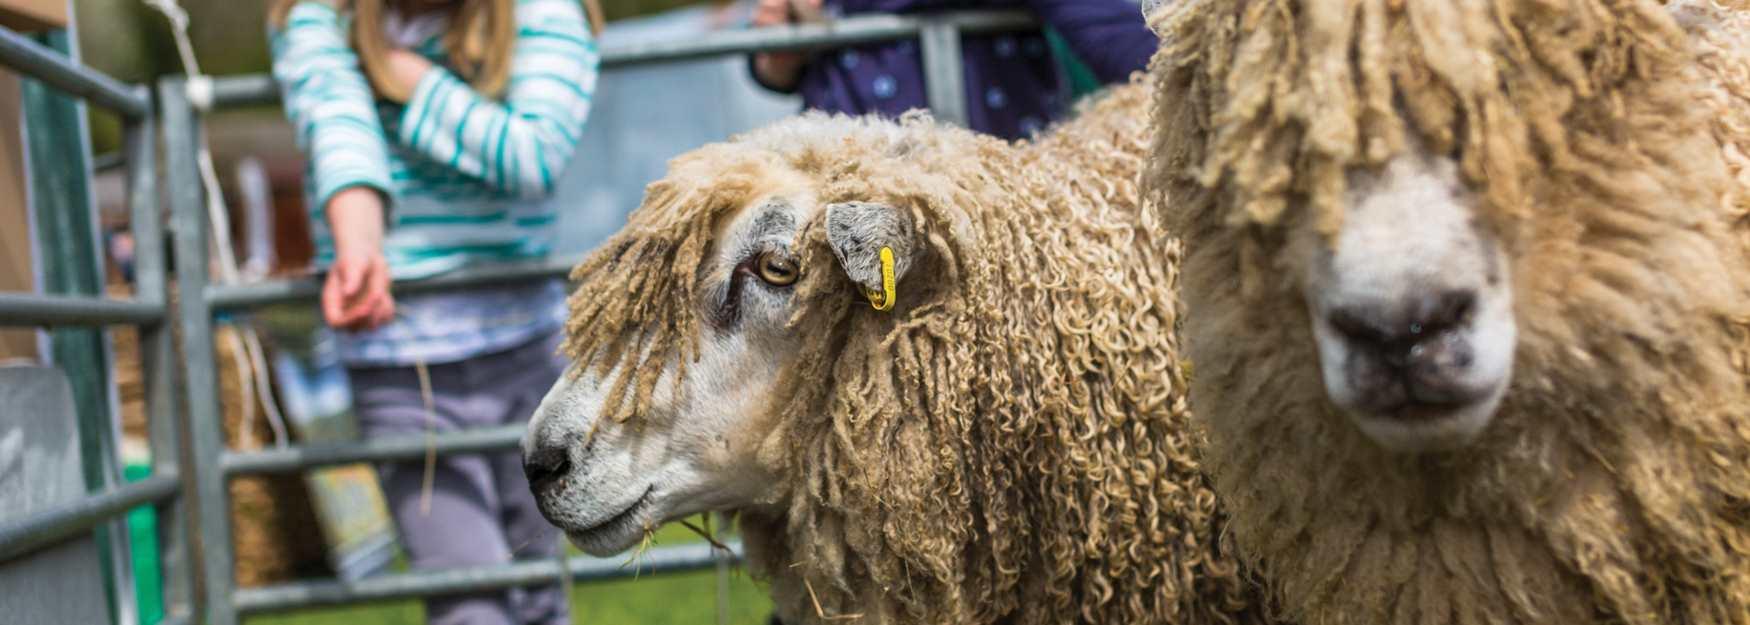 Sheep at Farm Park